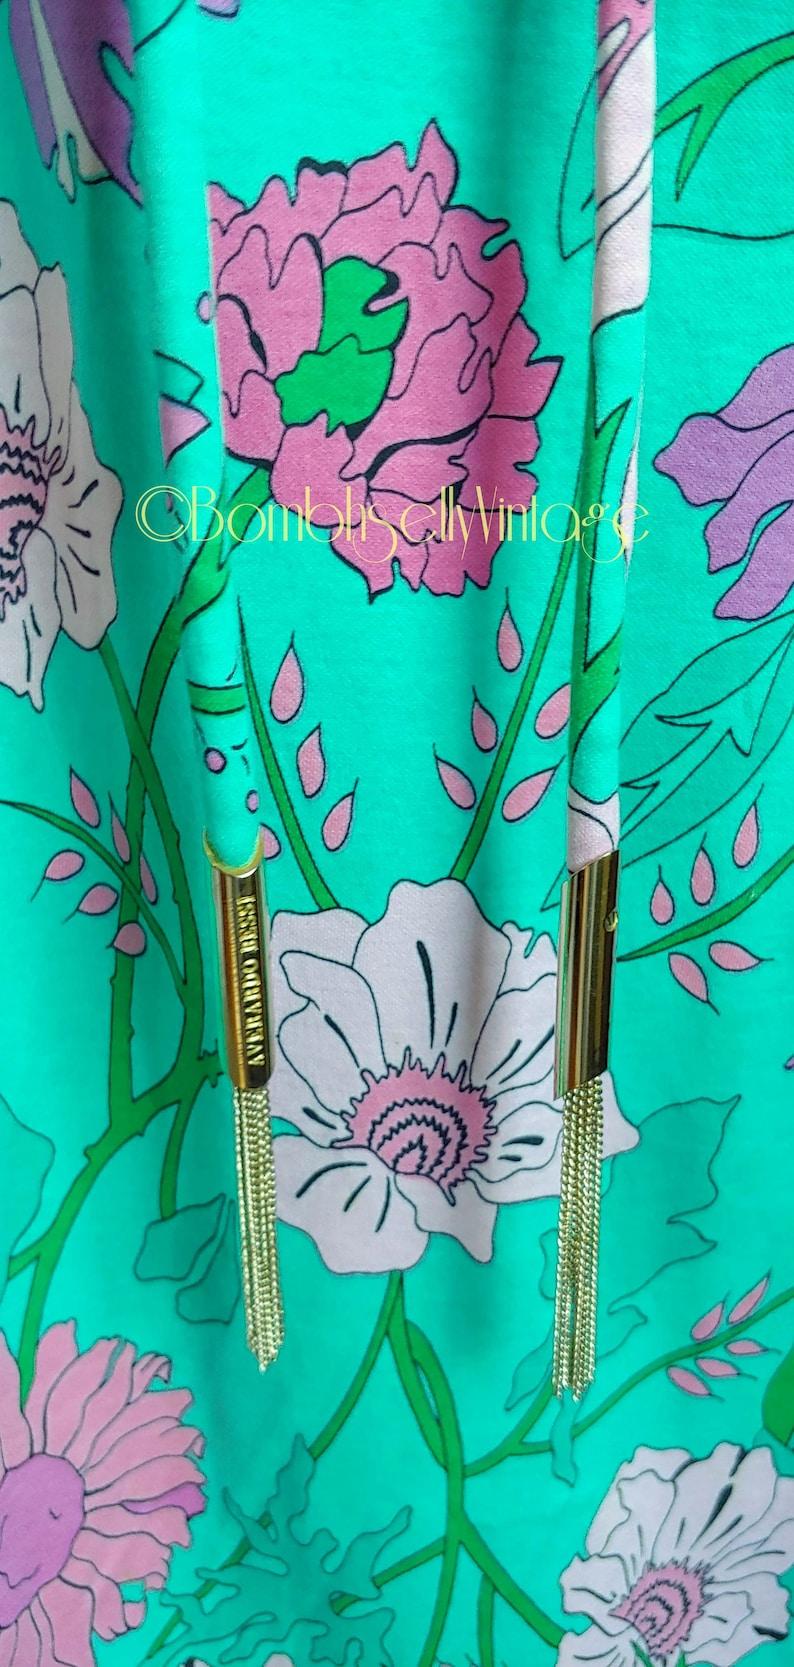 Vintage 70/'s Alverado Bessi Designer Cotton Jersey Beaded Shift Dress with Tassel Belt